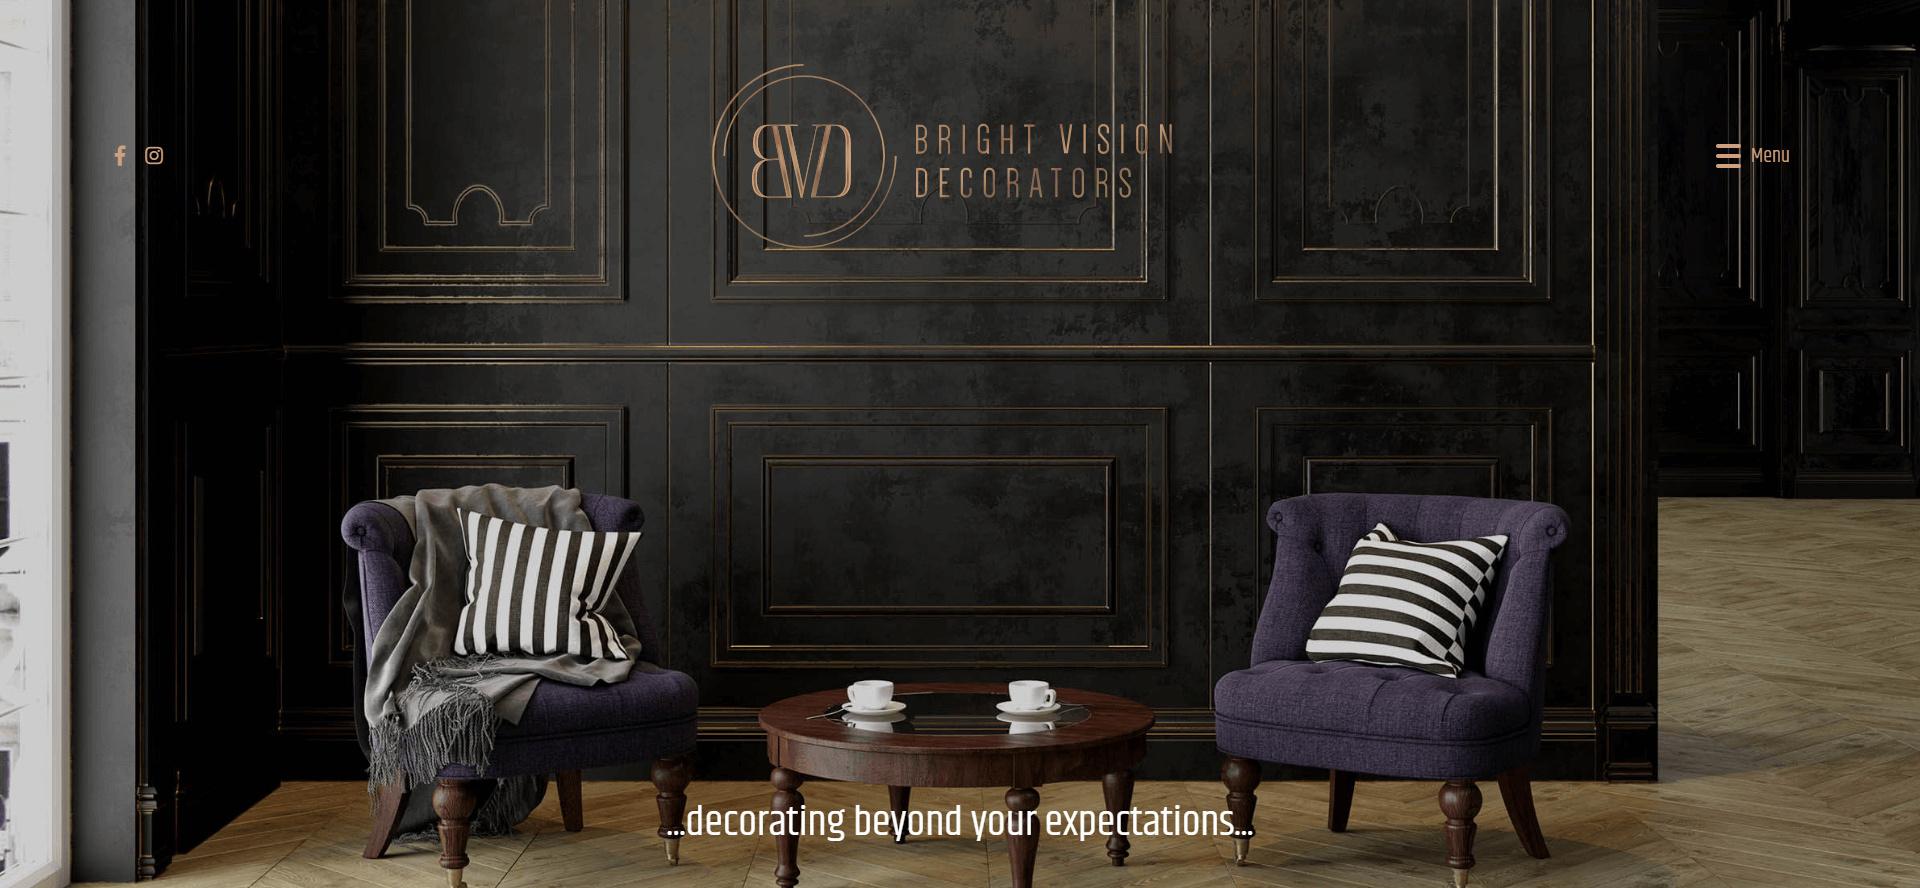 Bright Vision Decorators